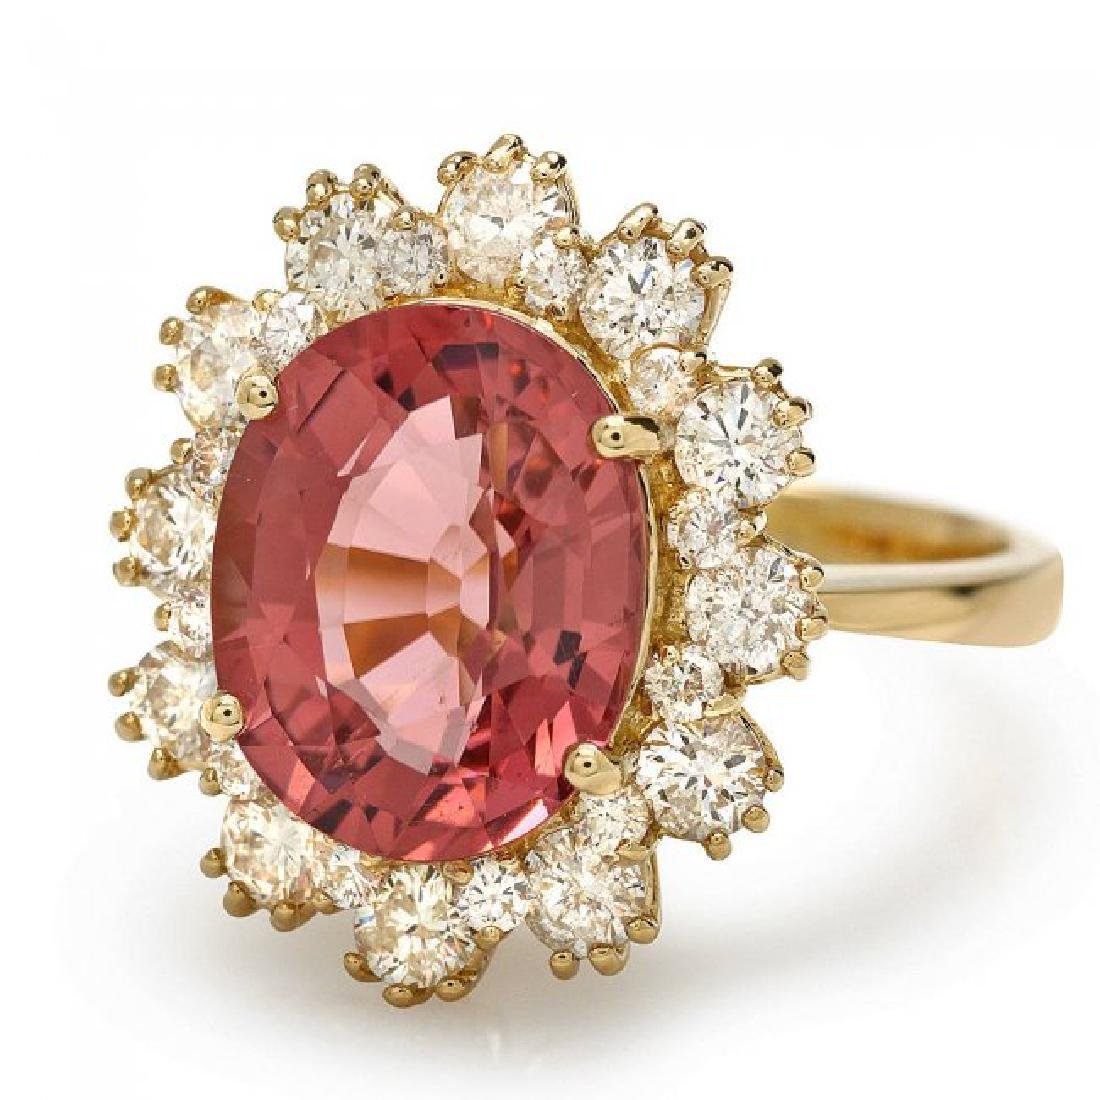 14k Gold 5ct Tourmaline 1.20ct Diamond Ring - 2